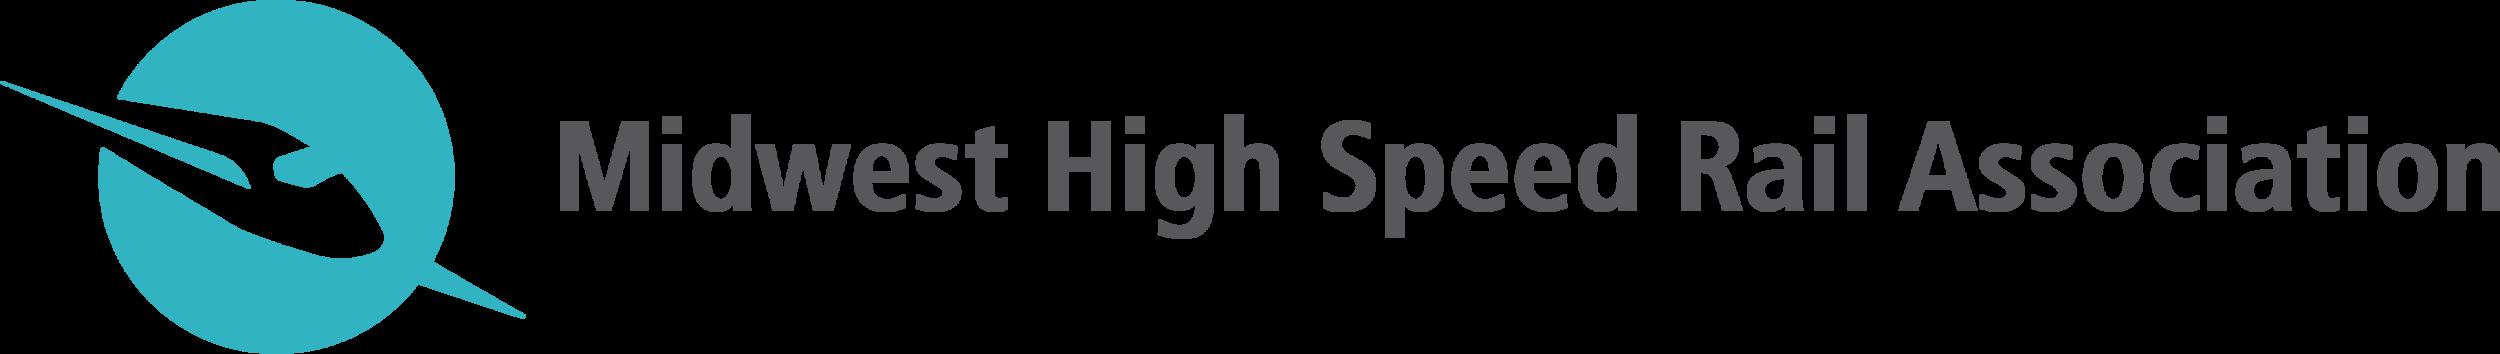 logo_mhsra.png